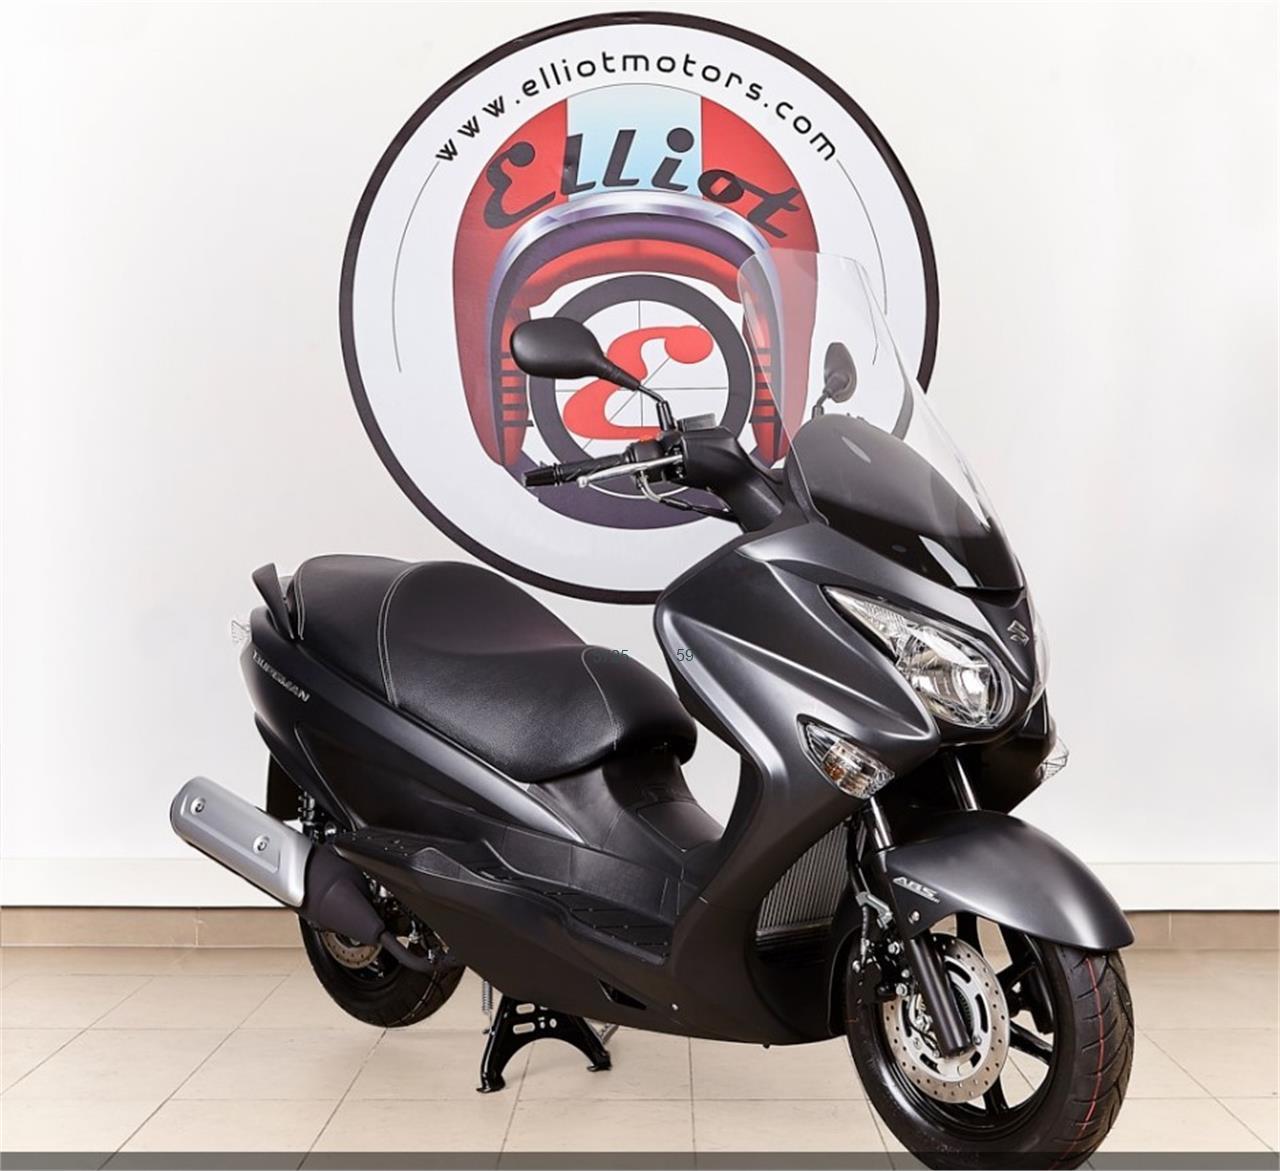 SUZUKI BURGMAN 125 ABS de venta